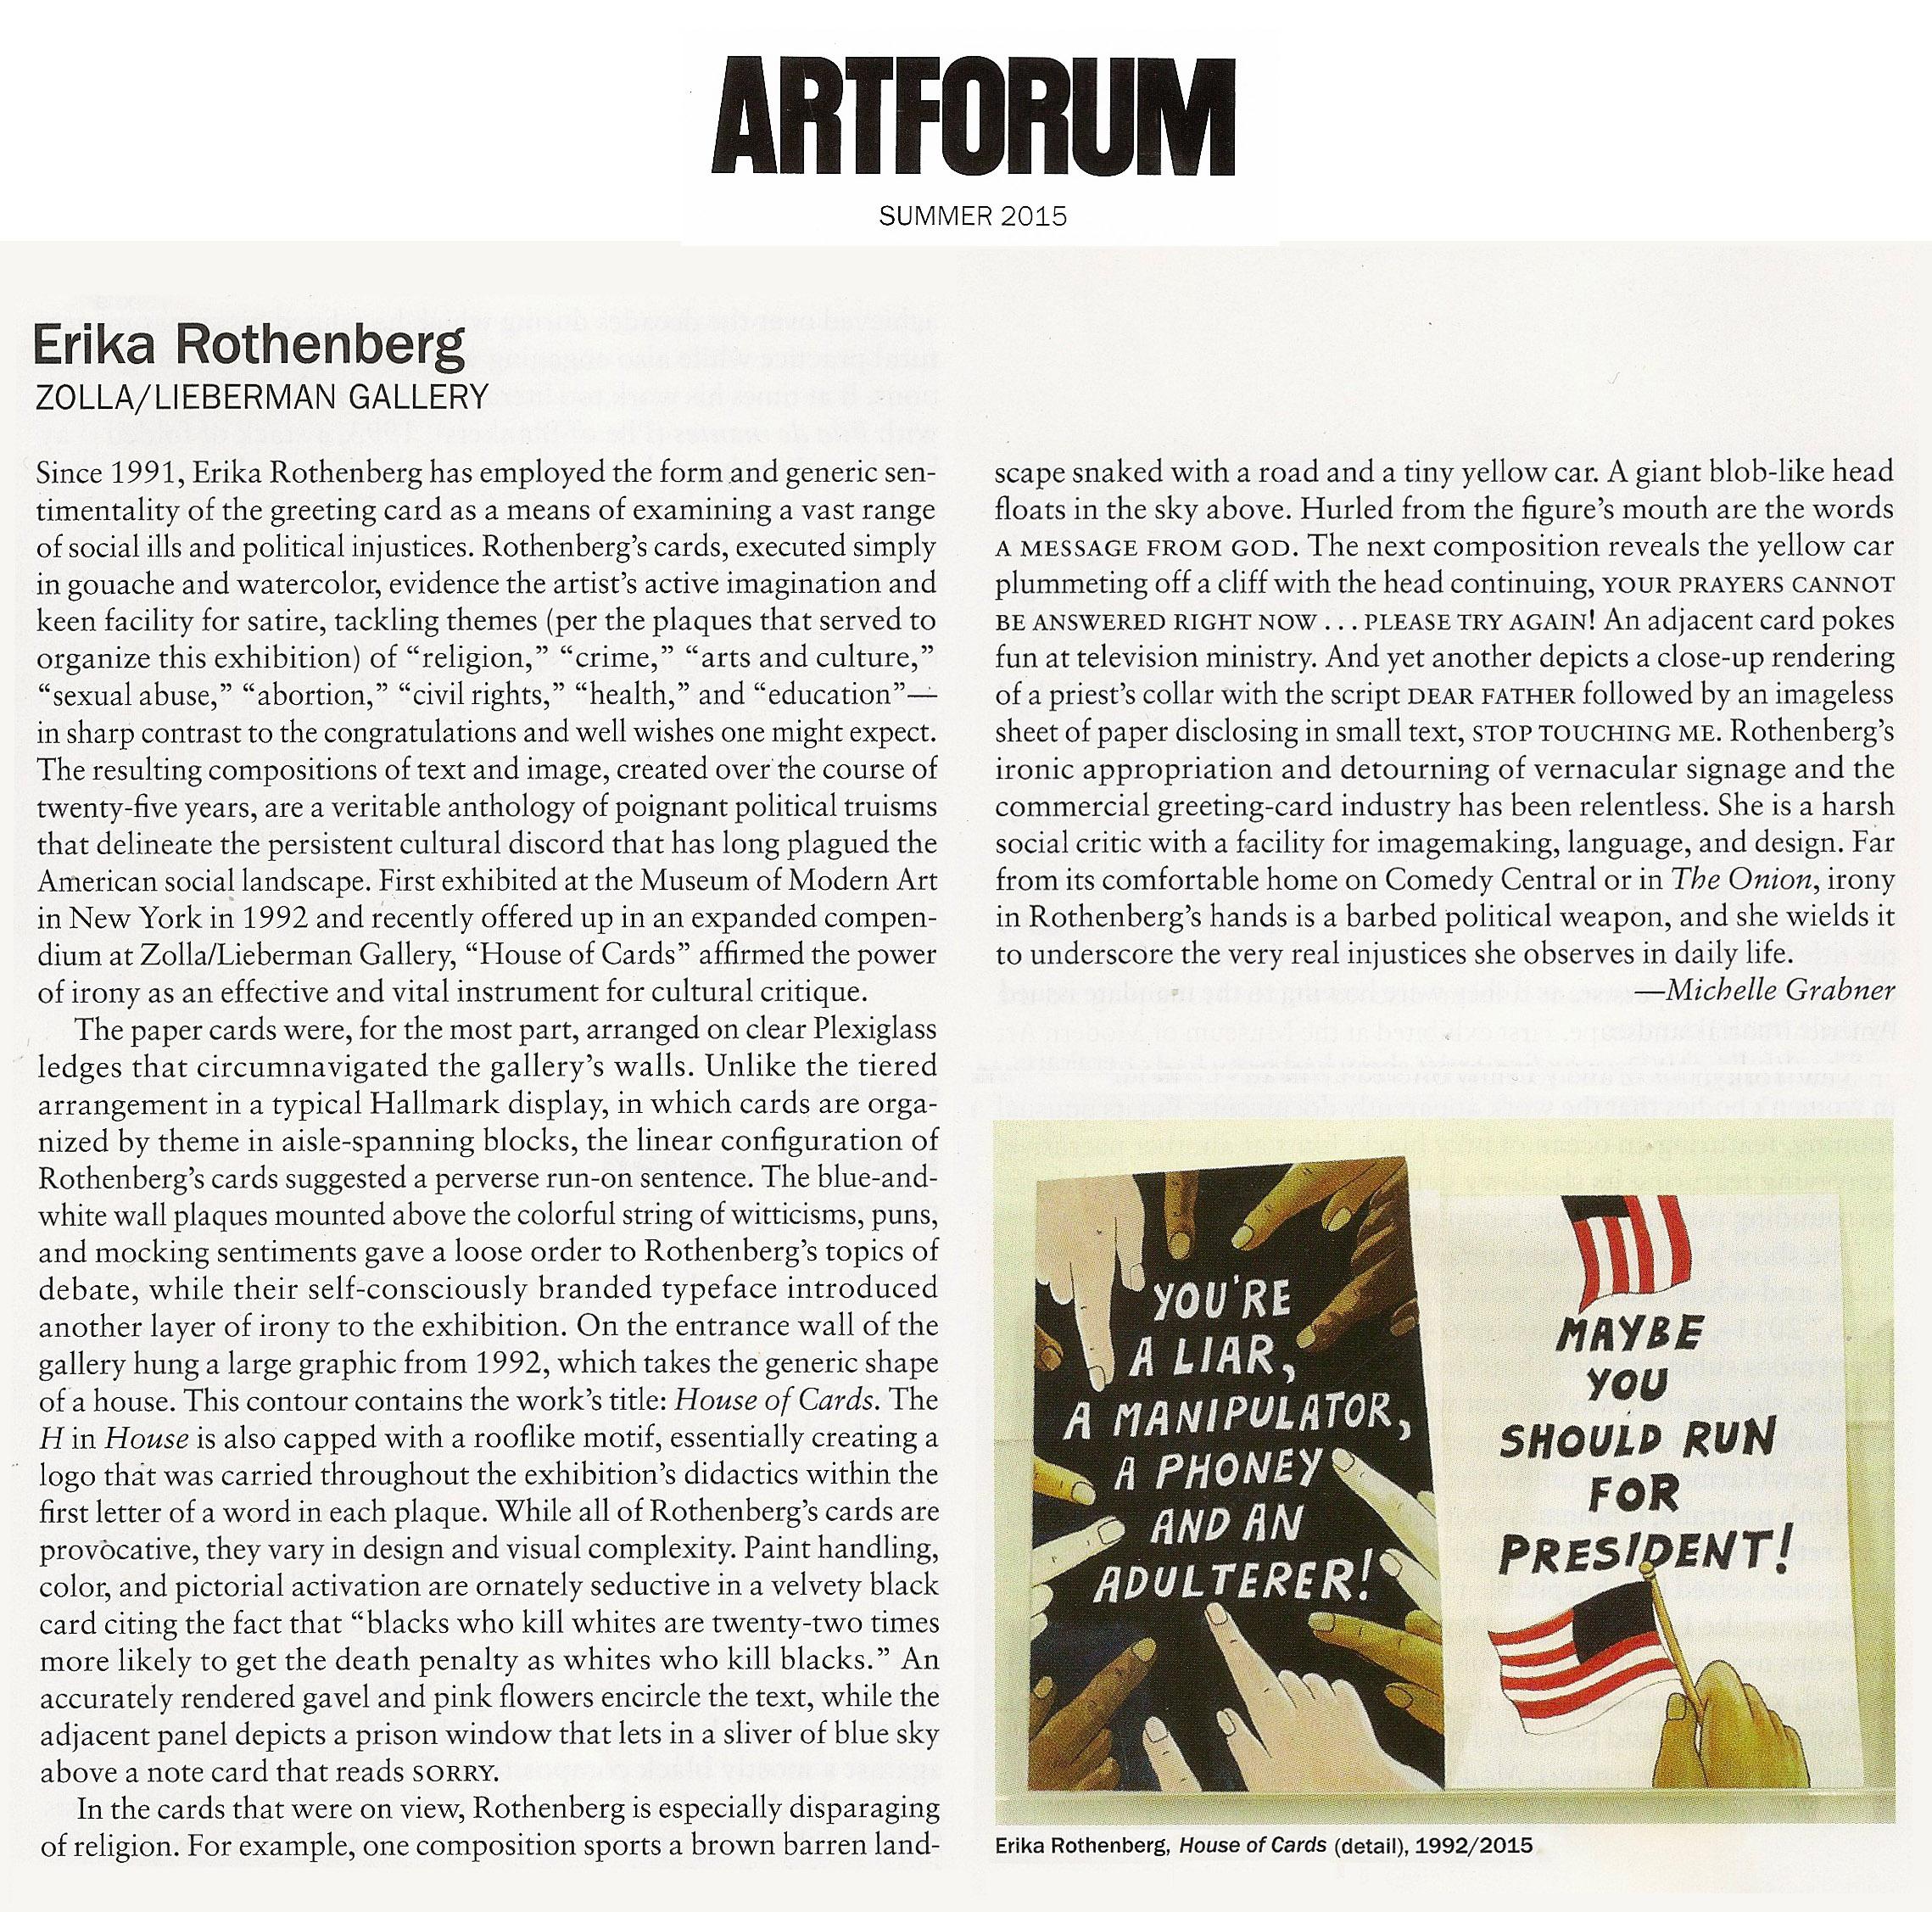 Artforum Summer 2015 Erika Rothenberg Review by Michelle Grabner